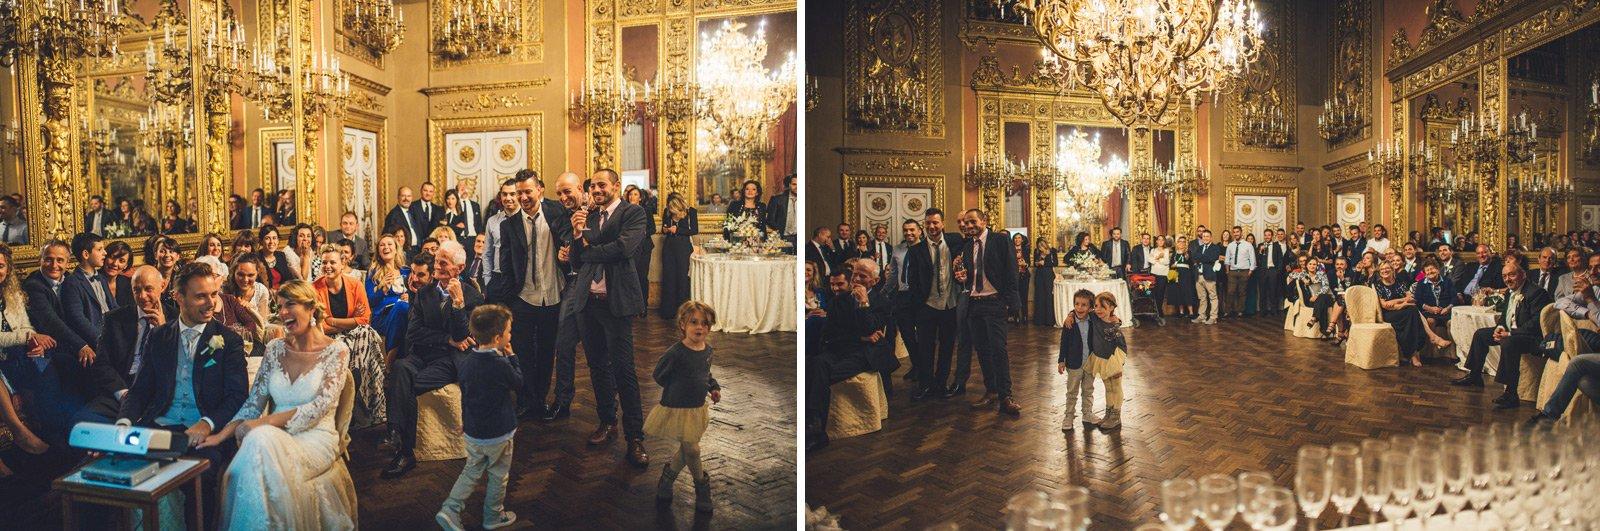 103-wedding-florence-palazzo-borghese